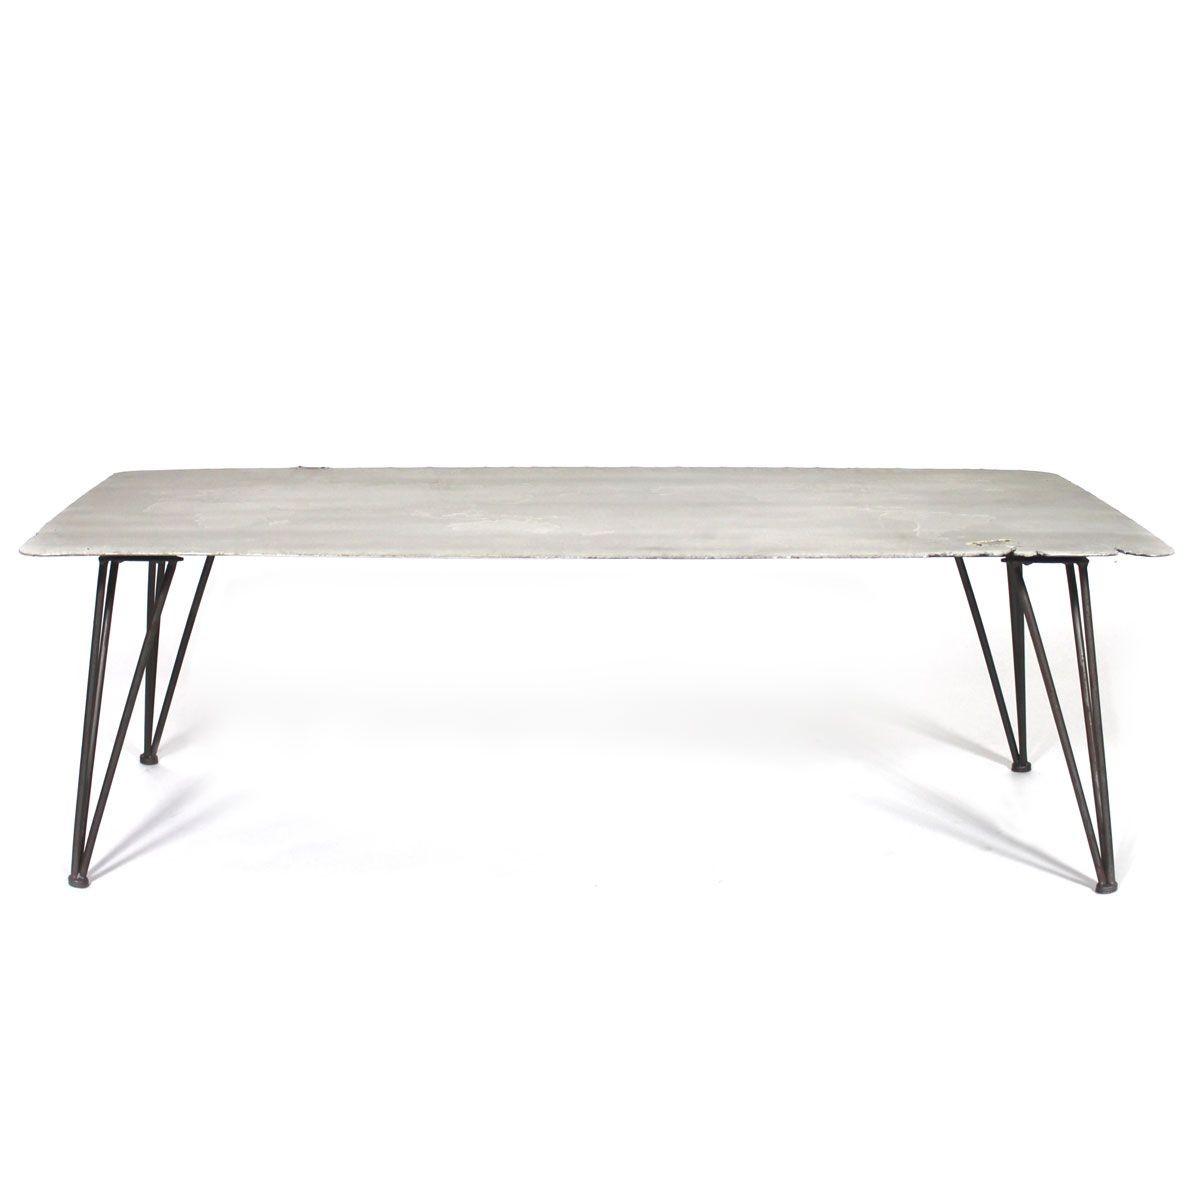 Table Basse Industrielle Ciment Et Metal Coffee Table Decor Table